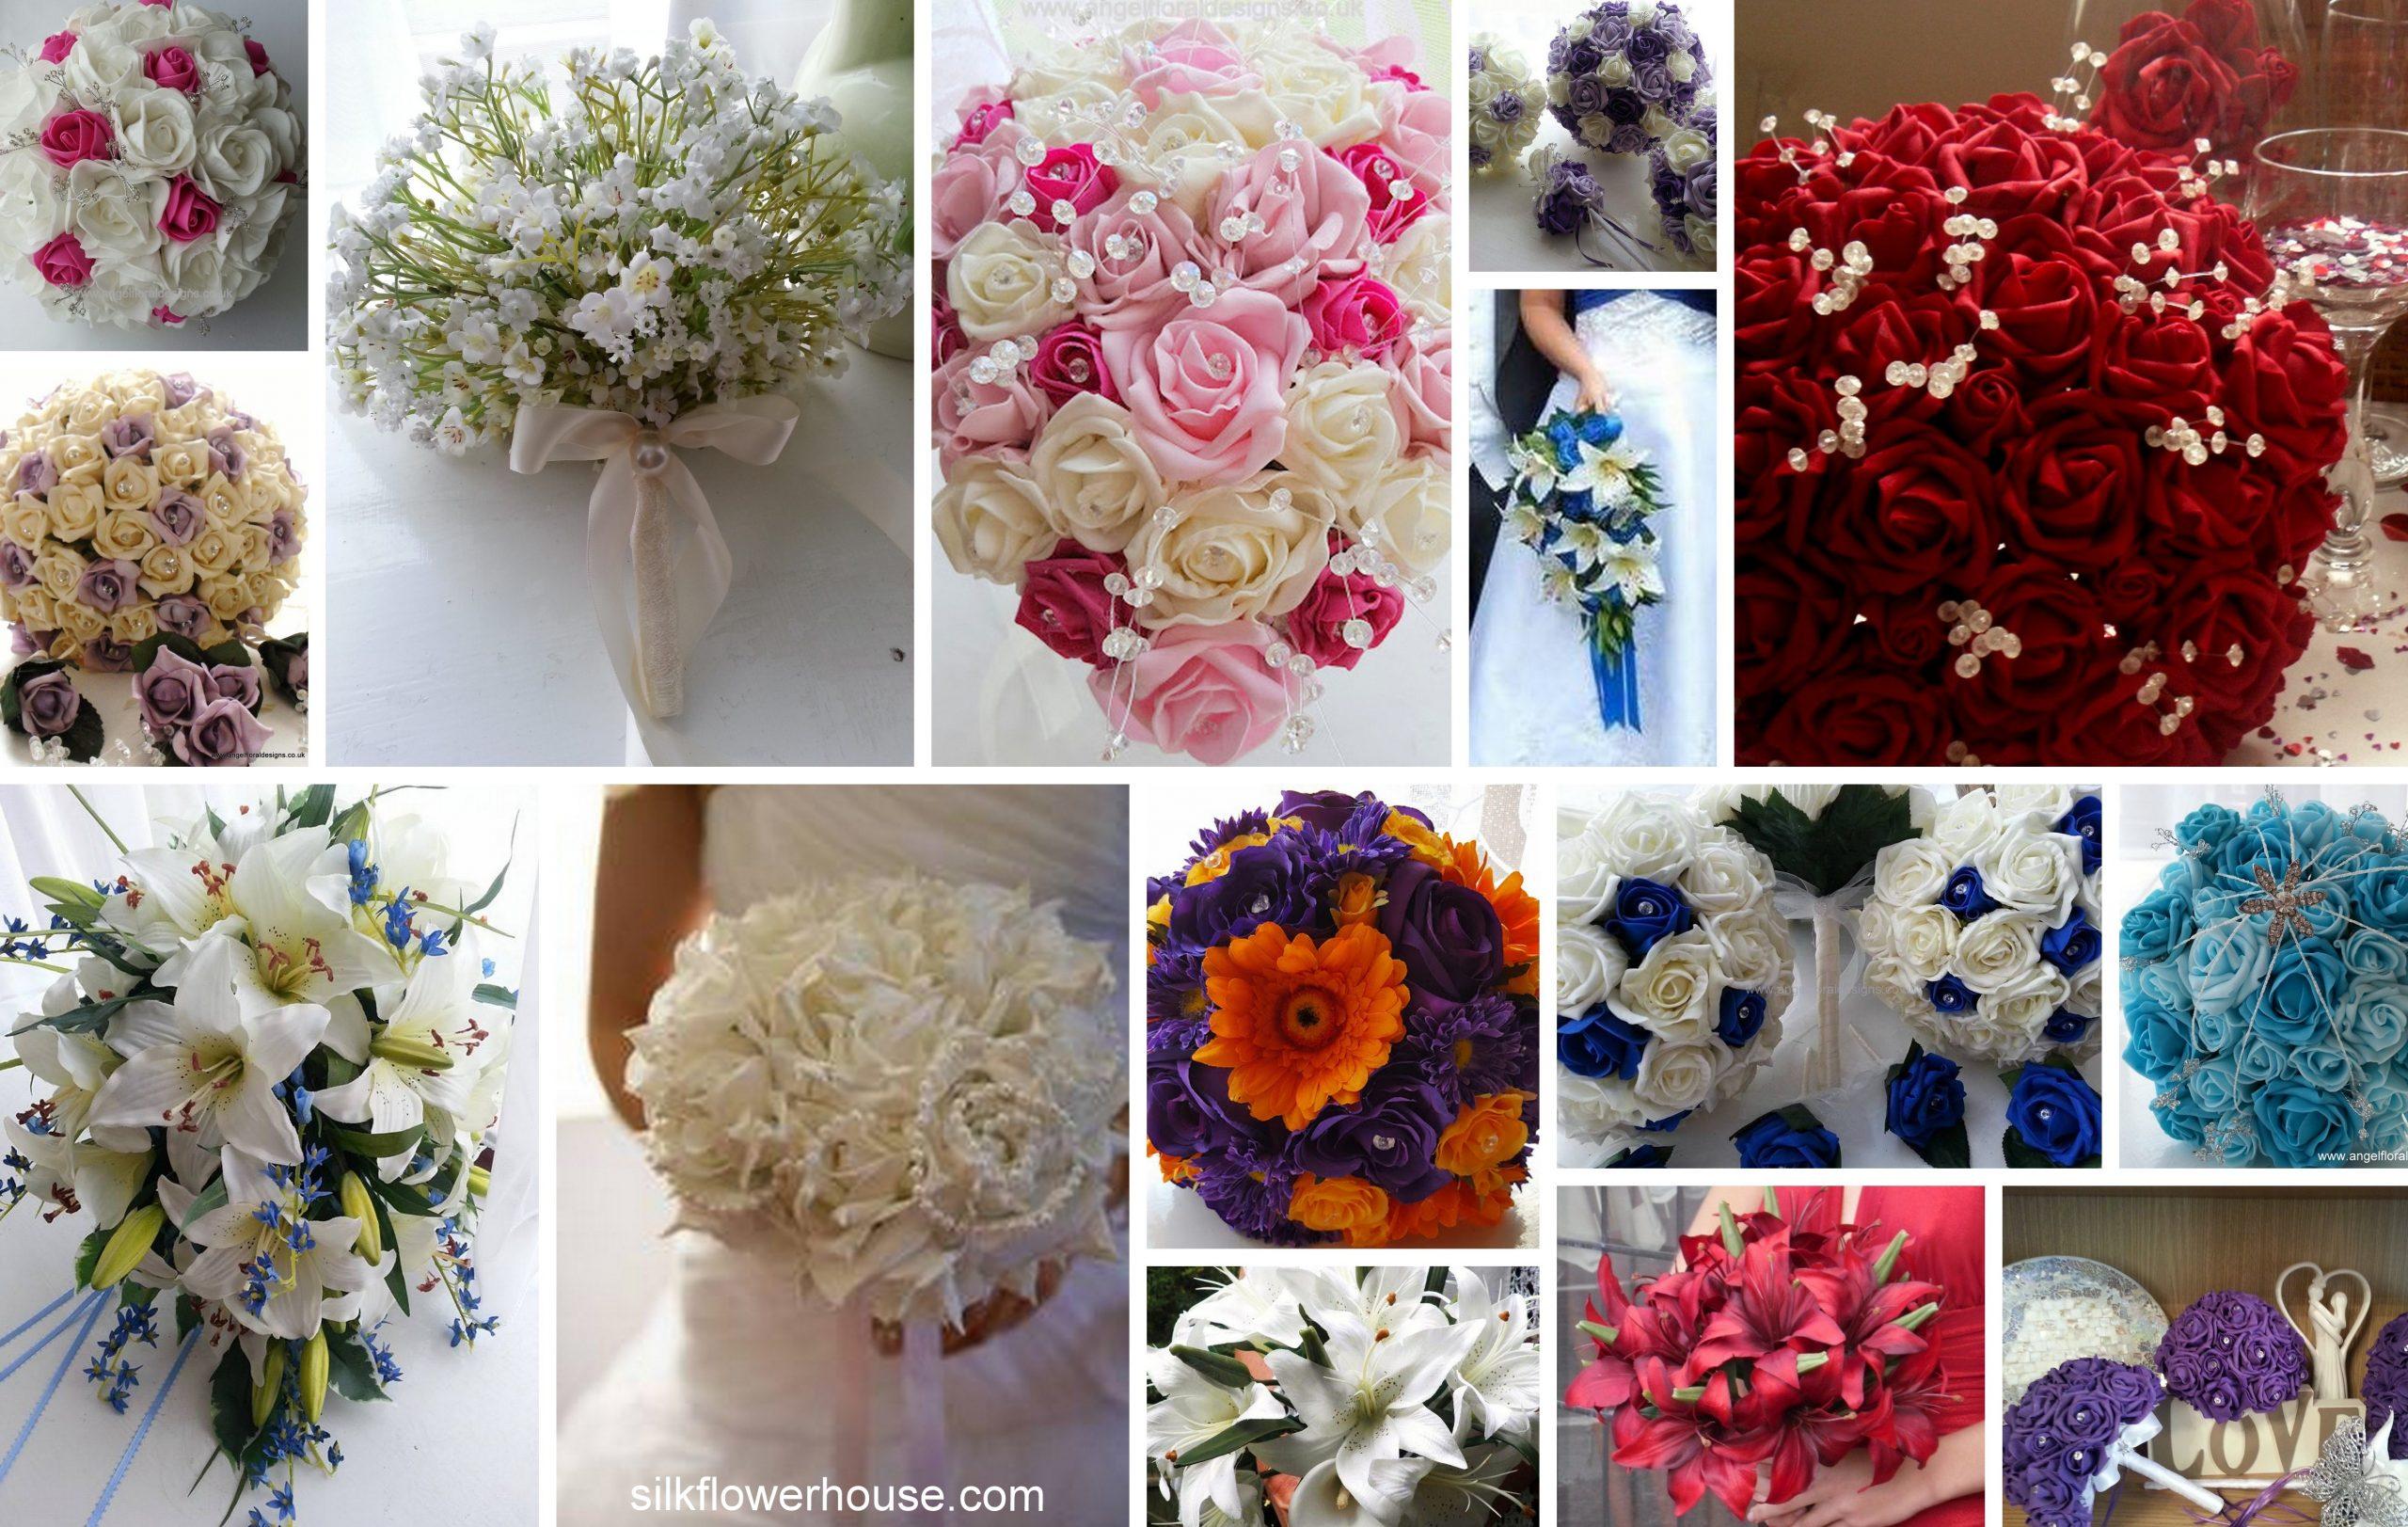 https://tietheknotwedding.co.uk/listings/silk-flower-house